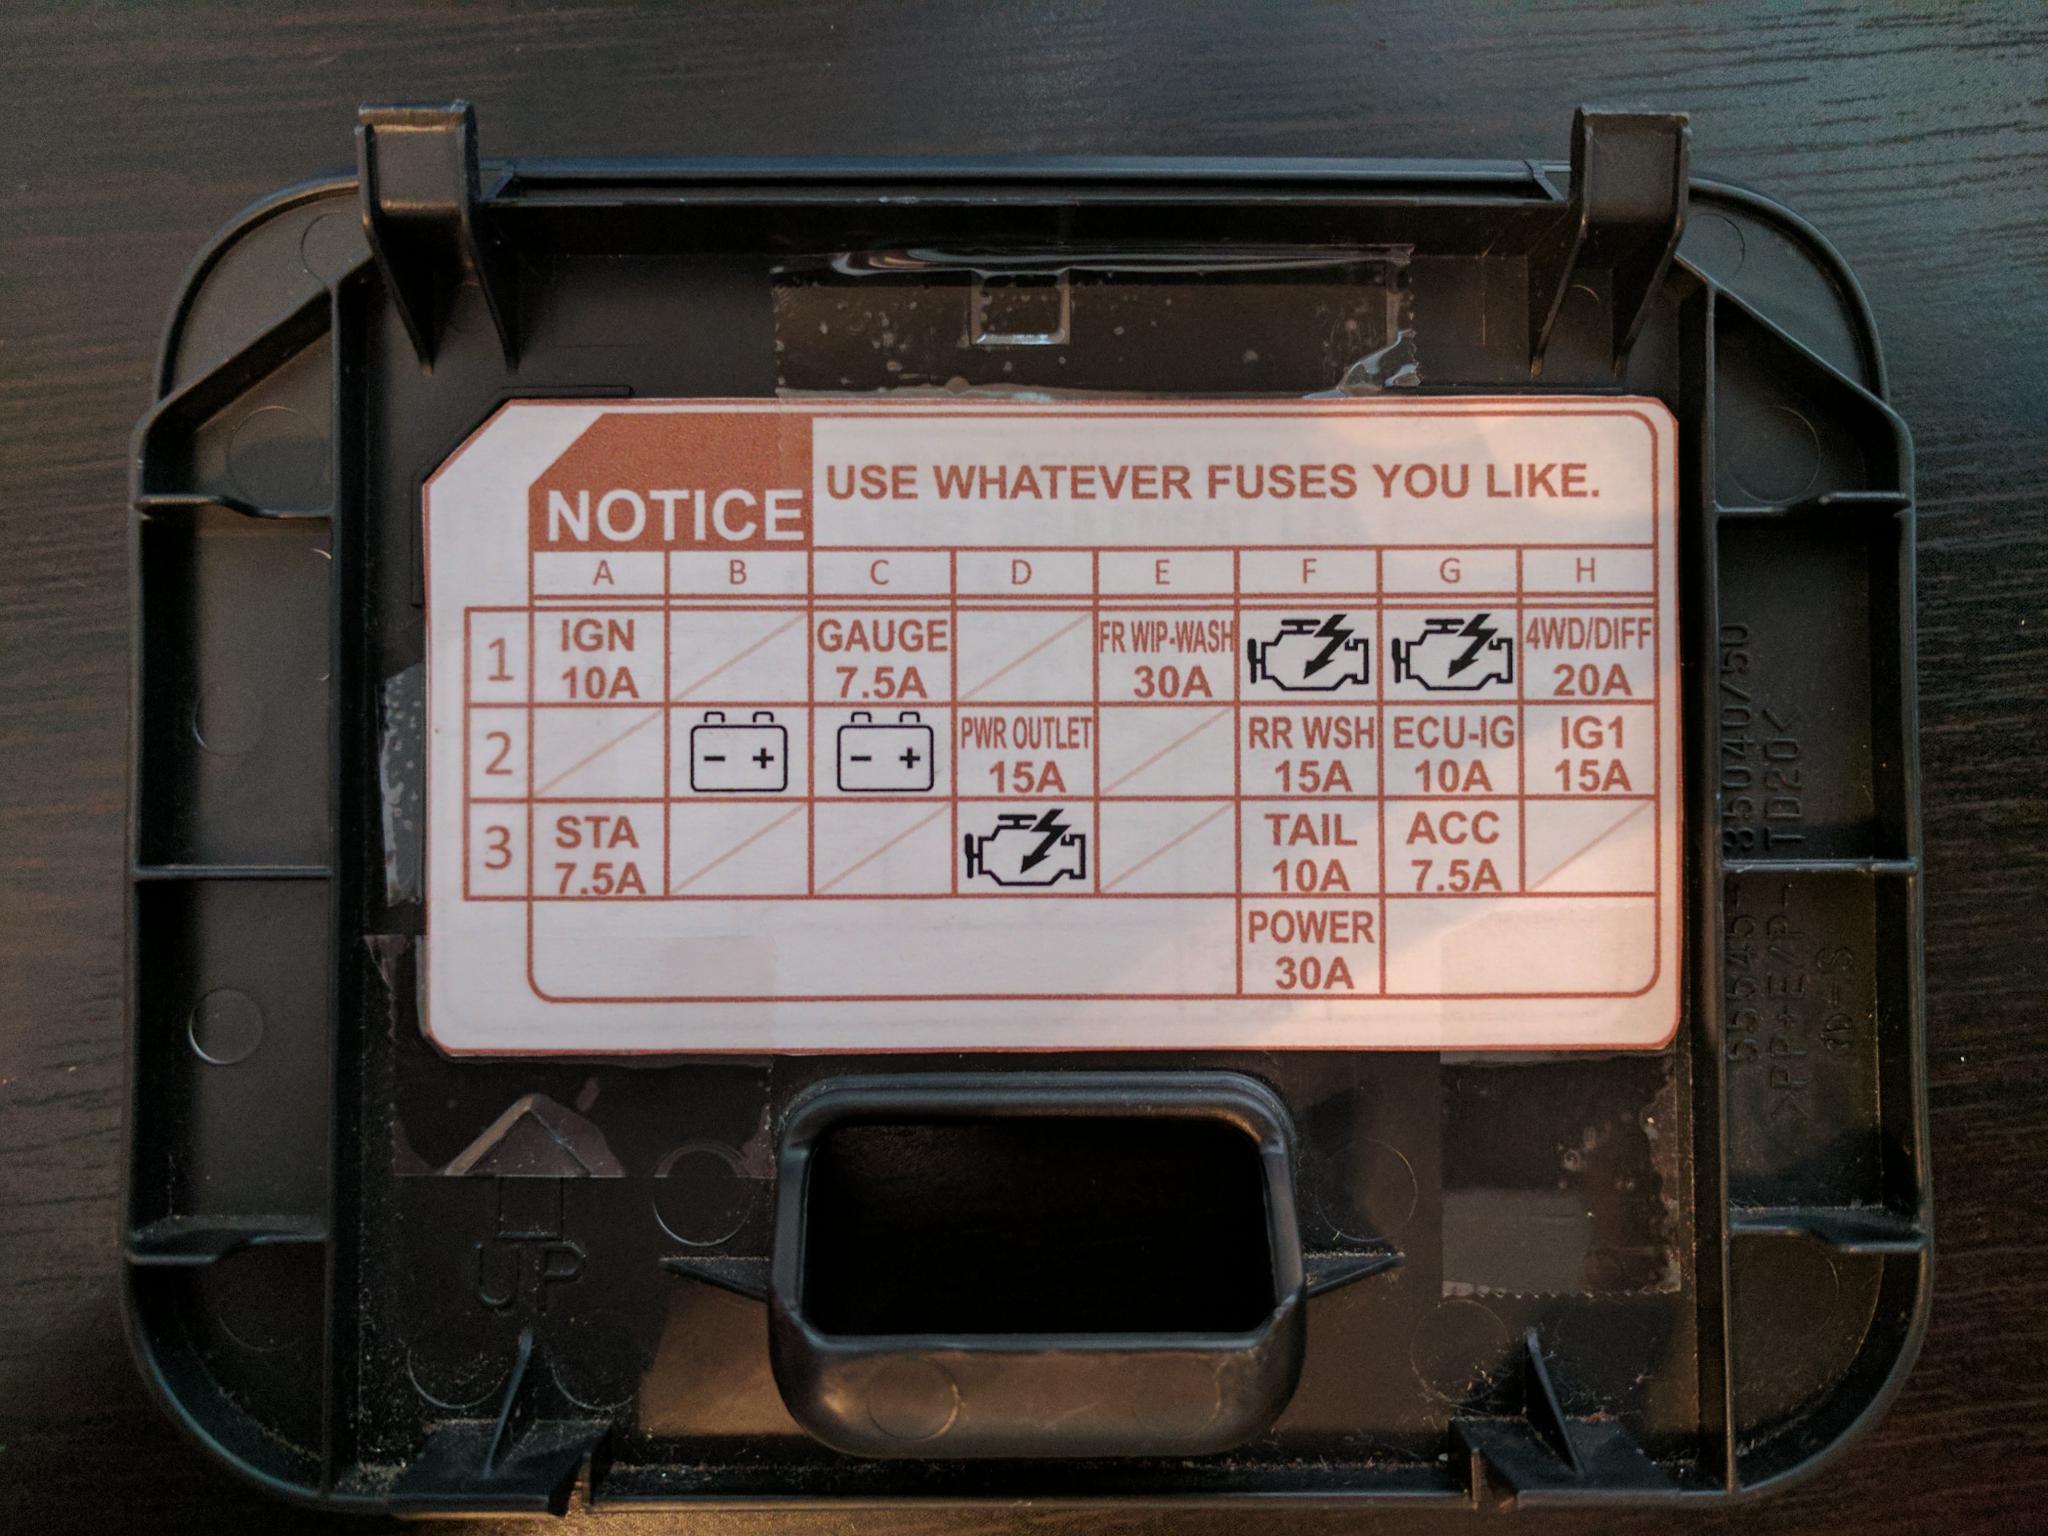 [SCHEMATICS_48YU]  Cabin Fuse Box Map | Toyota FJ Cruiser Forum | 2007 Toyota Fj Cruiser Fuse Box Diagram |  | Toyota FJ Cruiser Forum